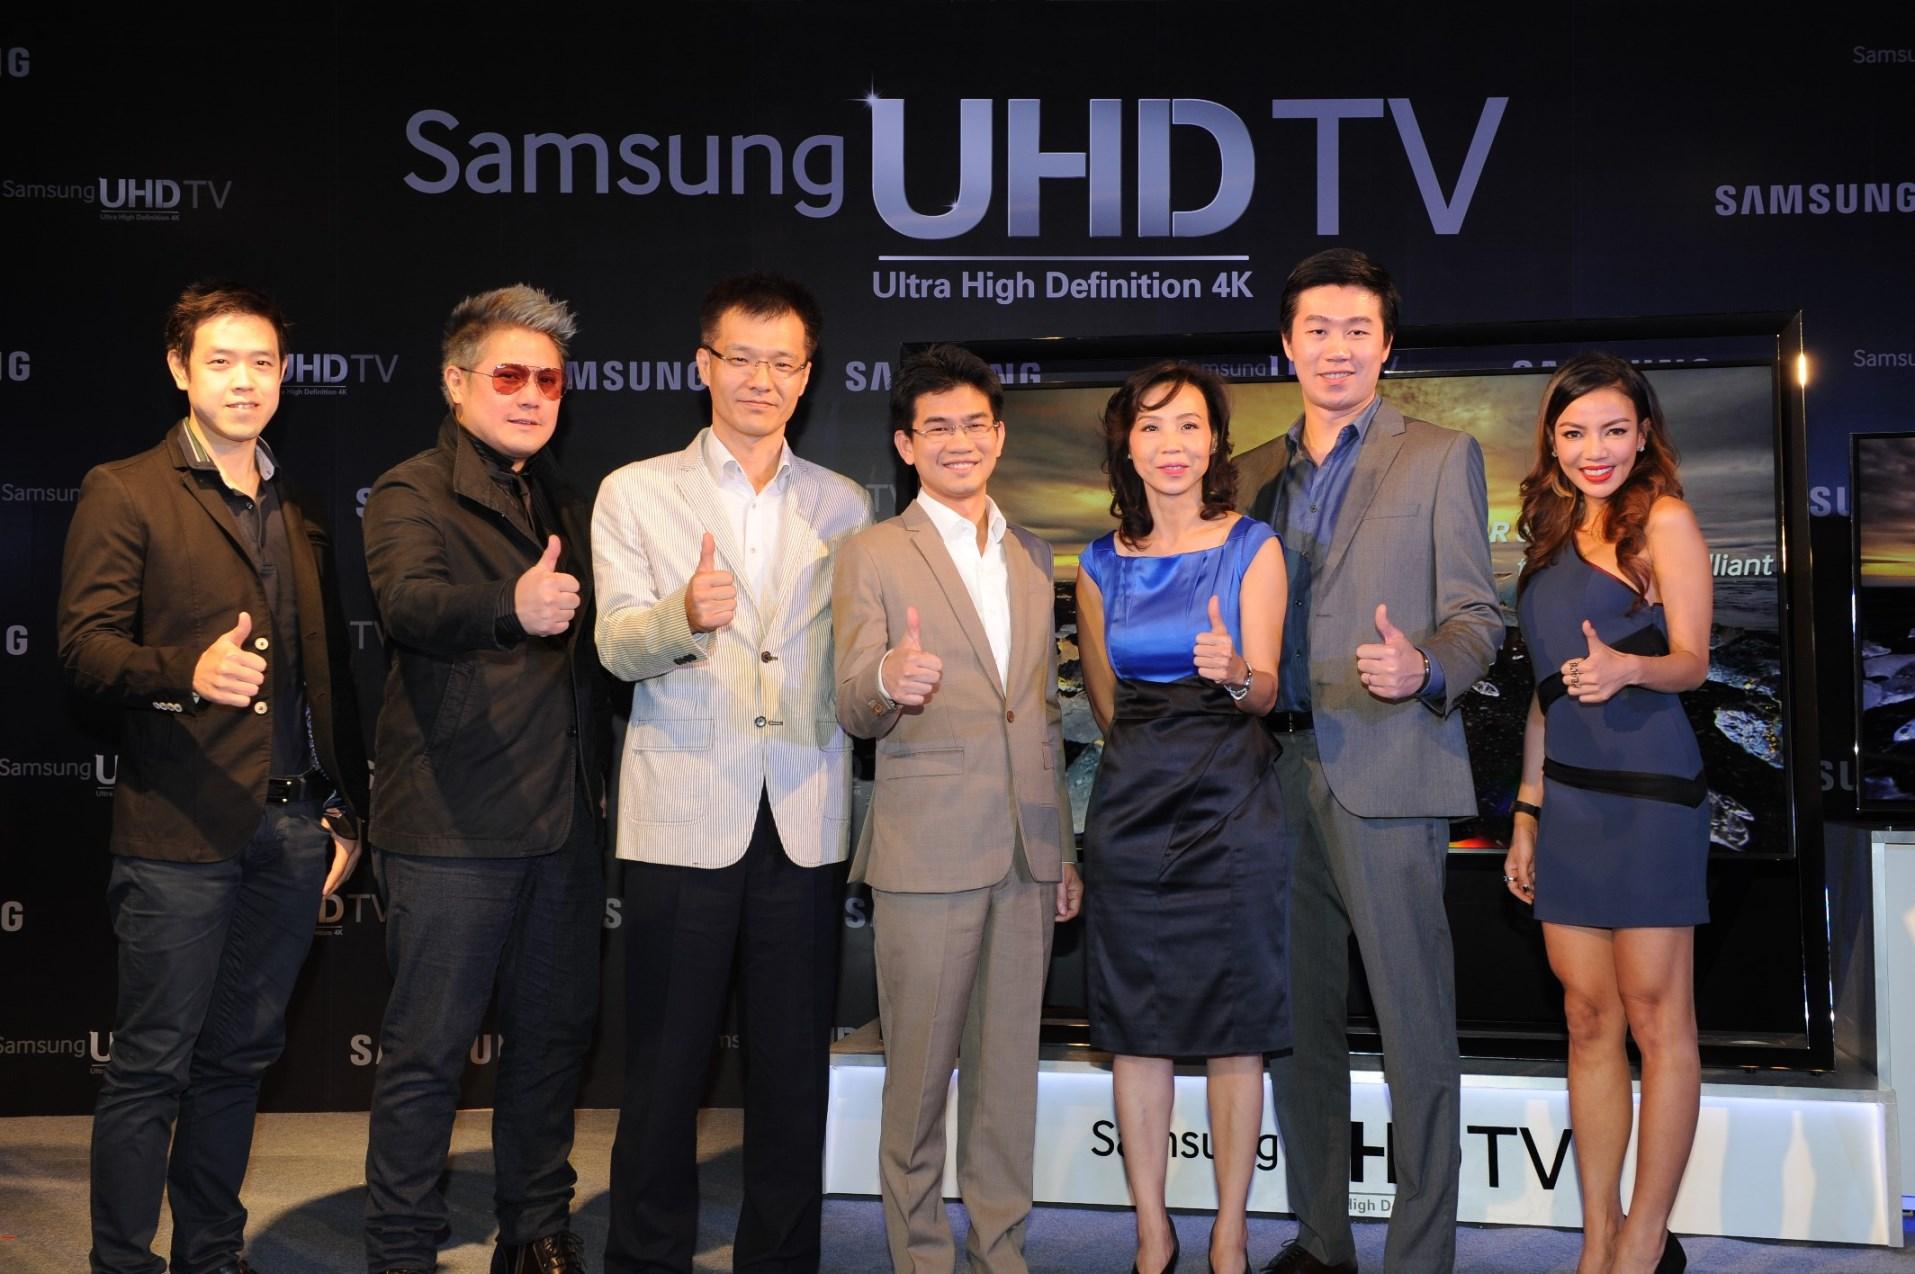 sumsung-uhd-tv (5)